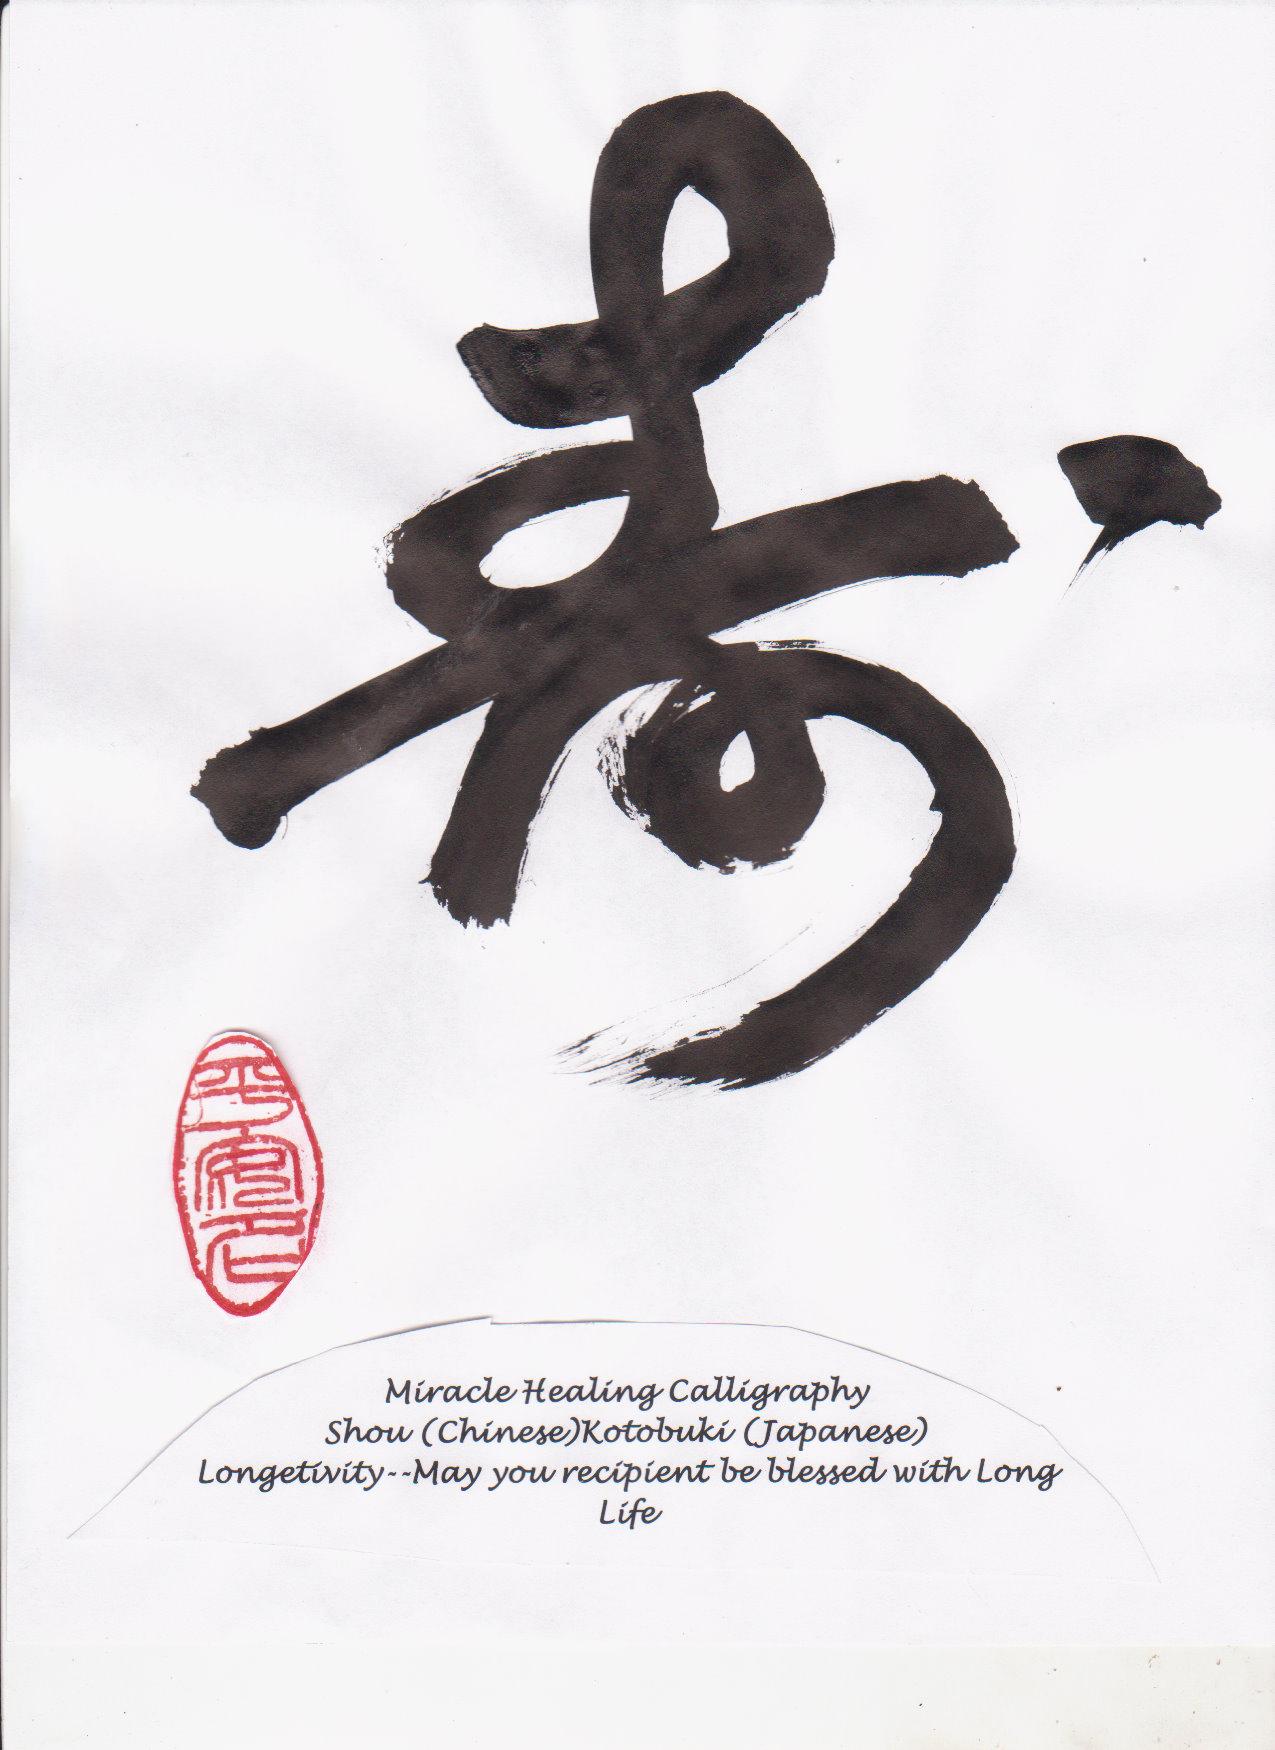 Miracle healing calligraphy long life japanese kotobuki miracle healing calligraphy long life japanese kotobuki biocorpaavc Gallery